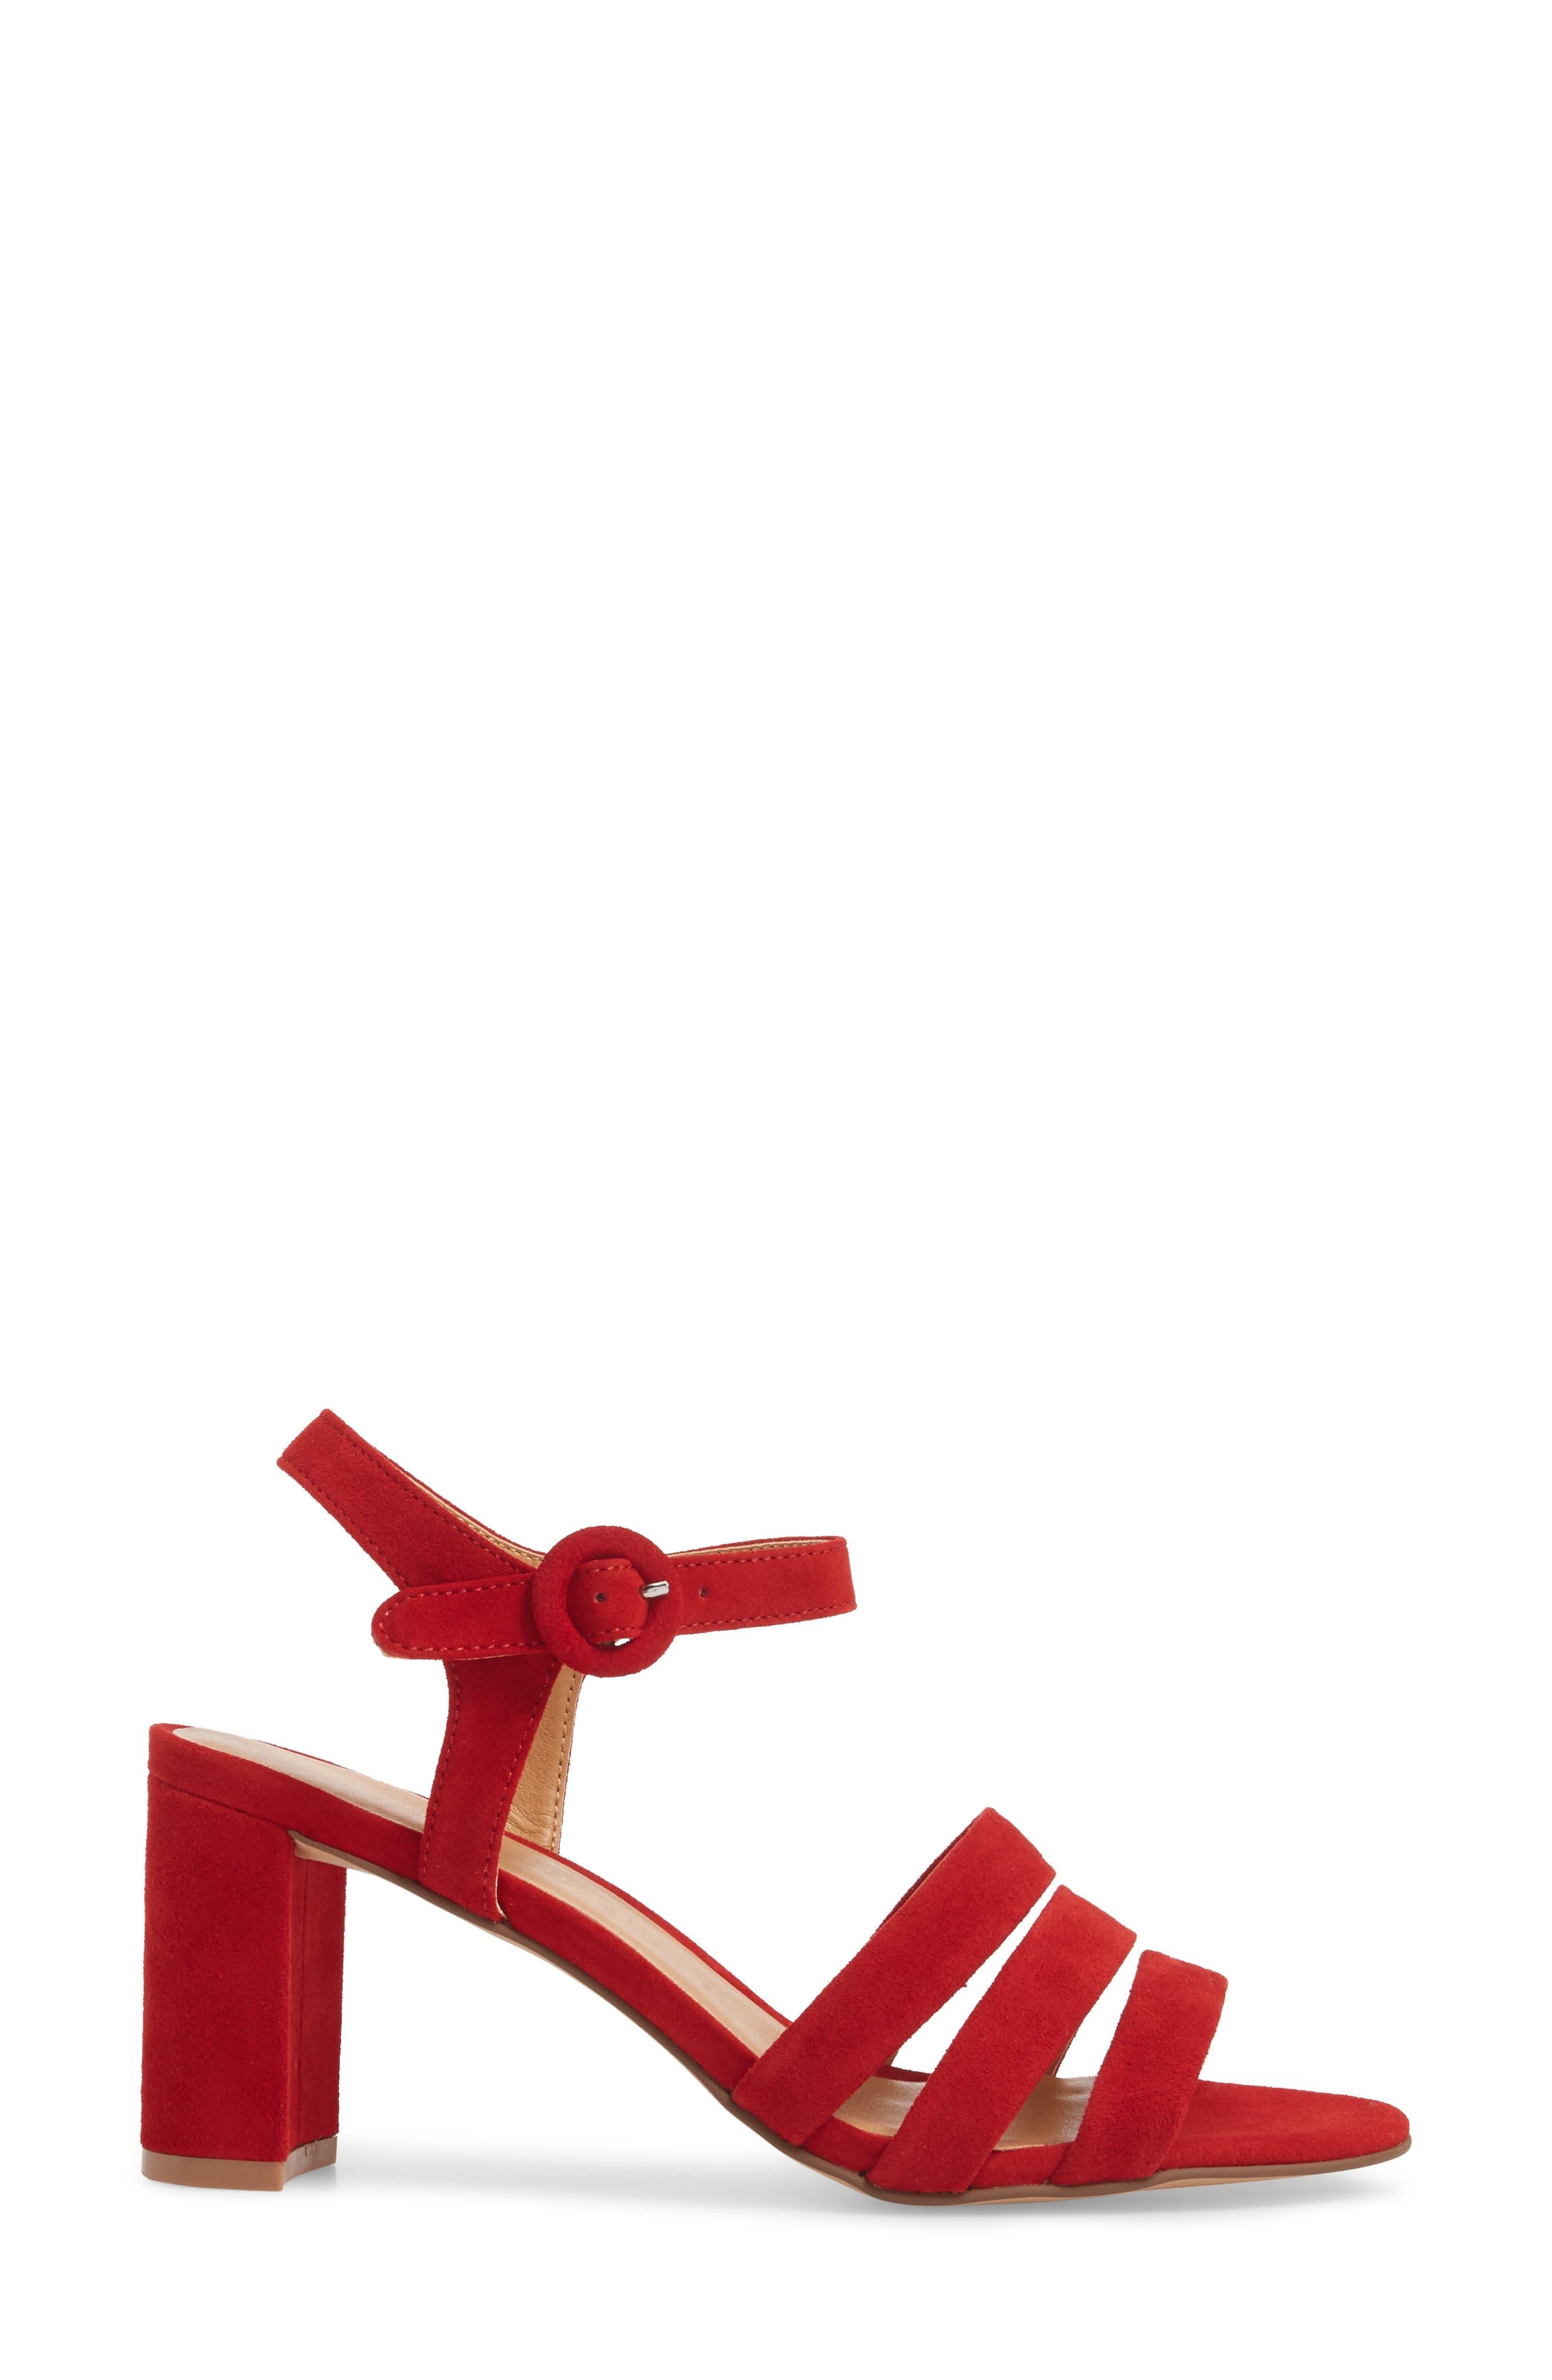 Ryden Strappy Sandal,                             Alternate thumbnail 3, color,                             Red